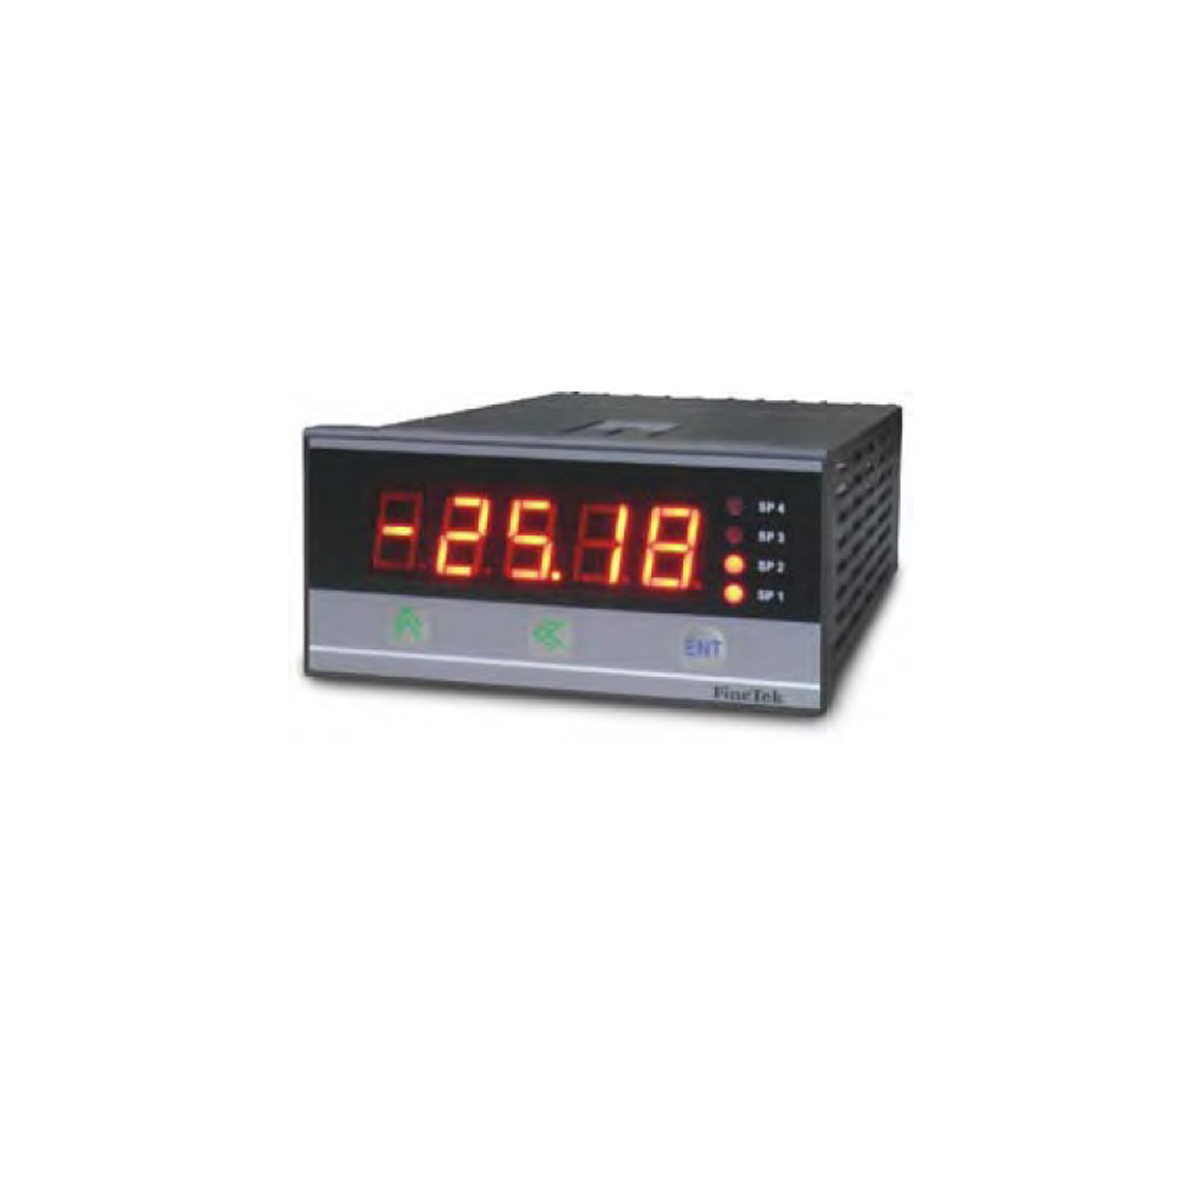 SANGI PM1530 Series แบบมิเตอร์ติดแผงสำหรับงานวัดระดับ